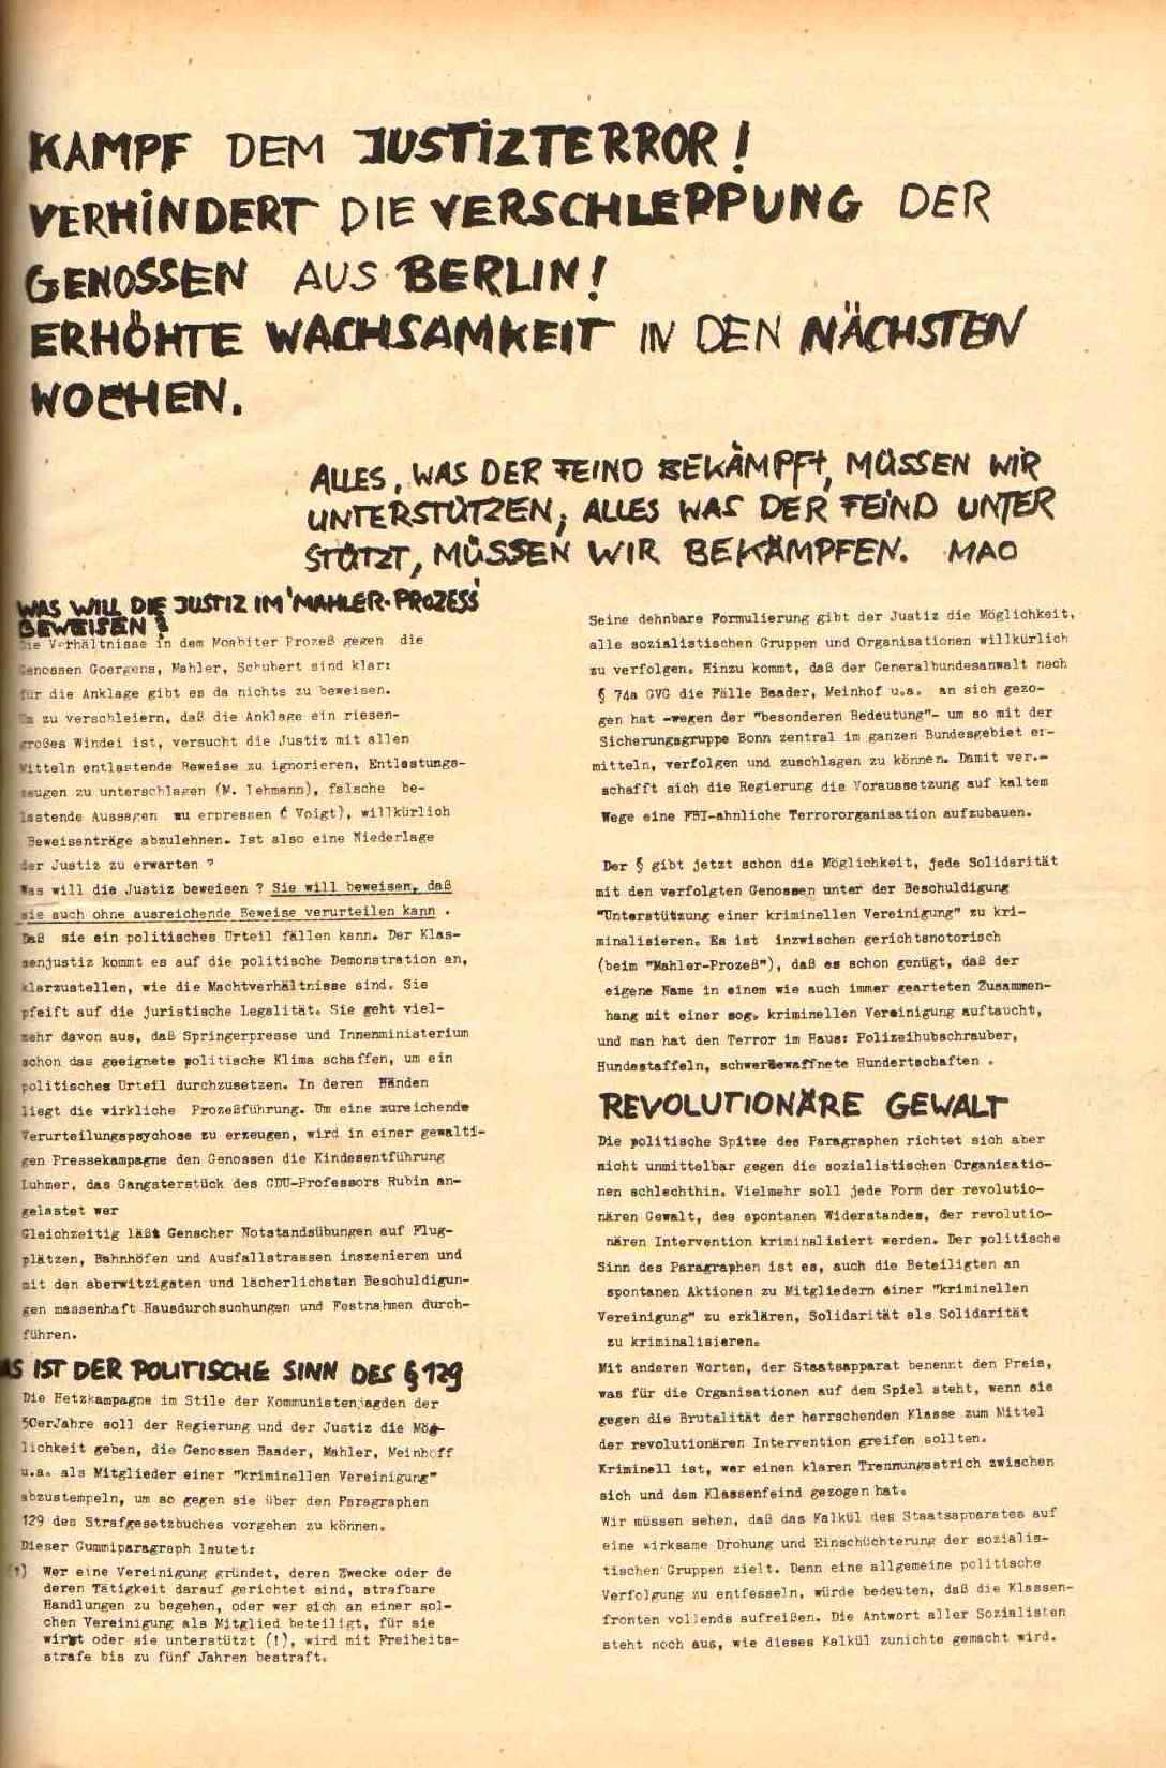 Berlin_Hochschulkampf_1971_08_07